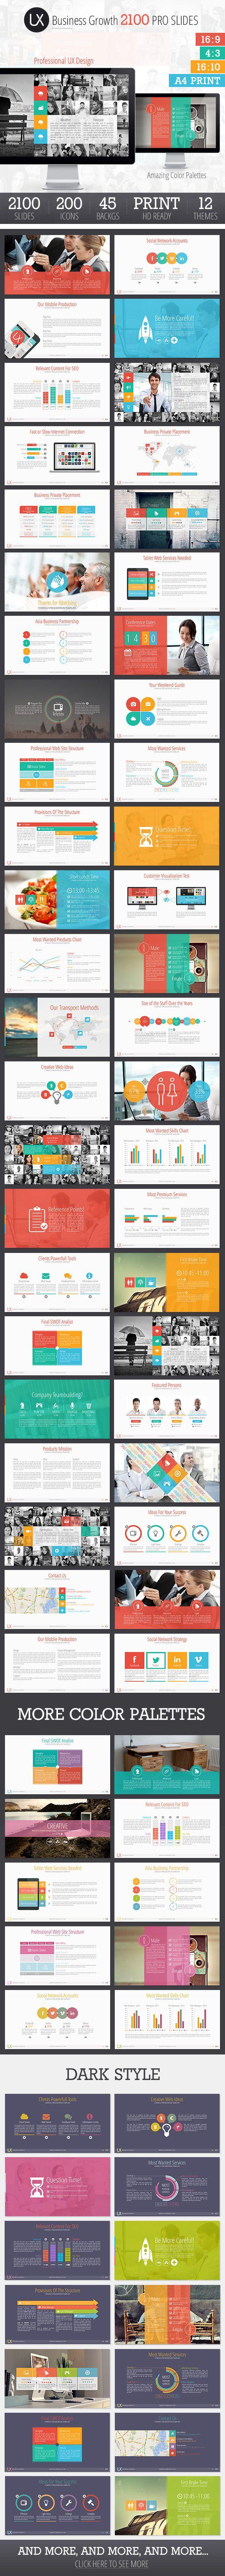 UX Design Presentation Keynote Template #keynotetemplate #keynote #presentation Download: http://graphicriver.net/item/ux-design-presentation-template/8182089?ref=ksioks